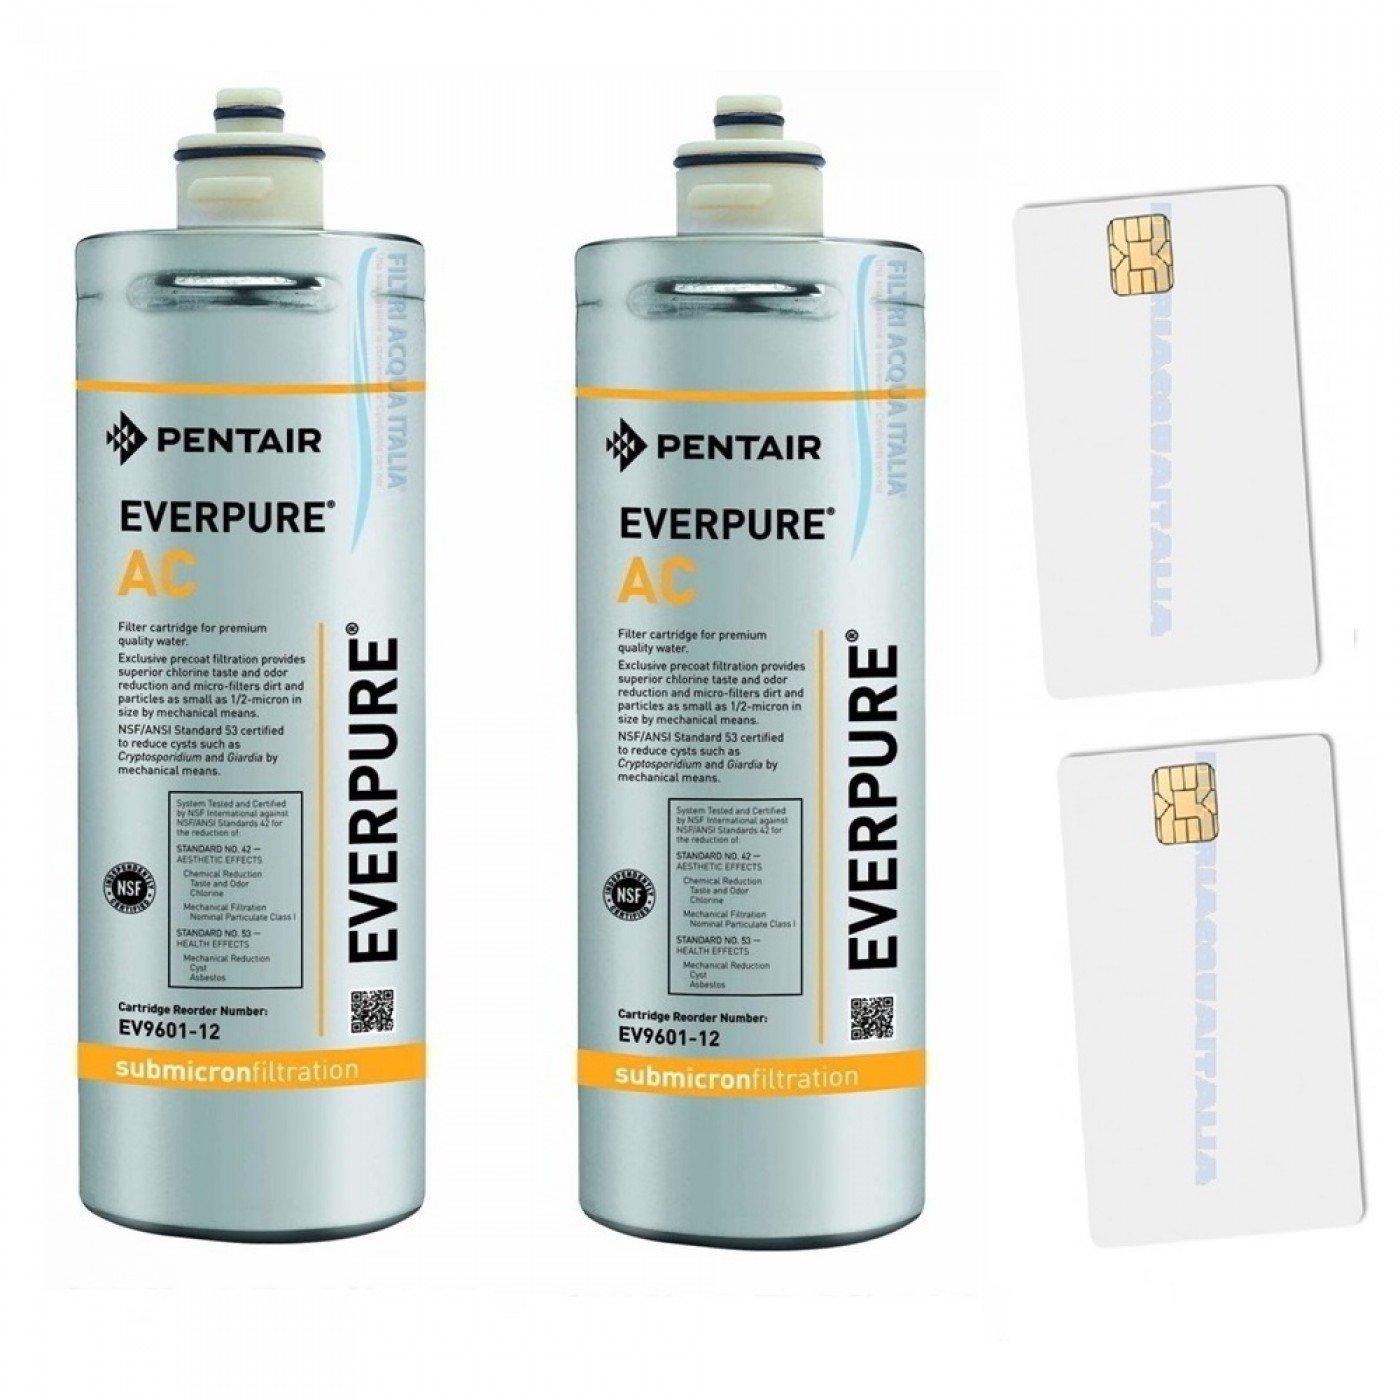 2 Filtri Everpure AC + Scheda Sblocco